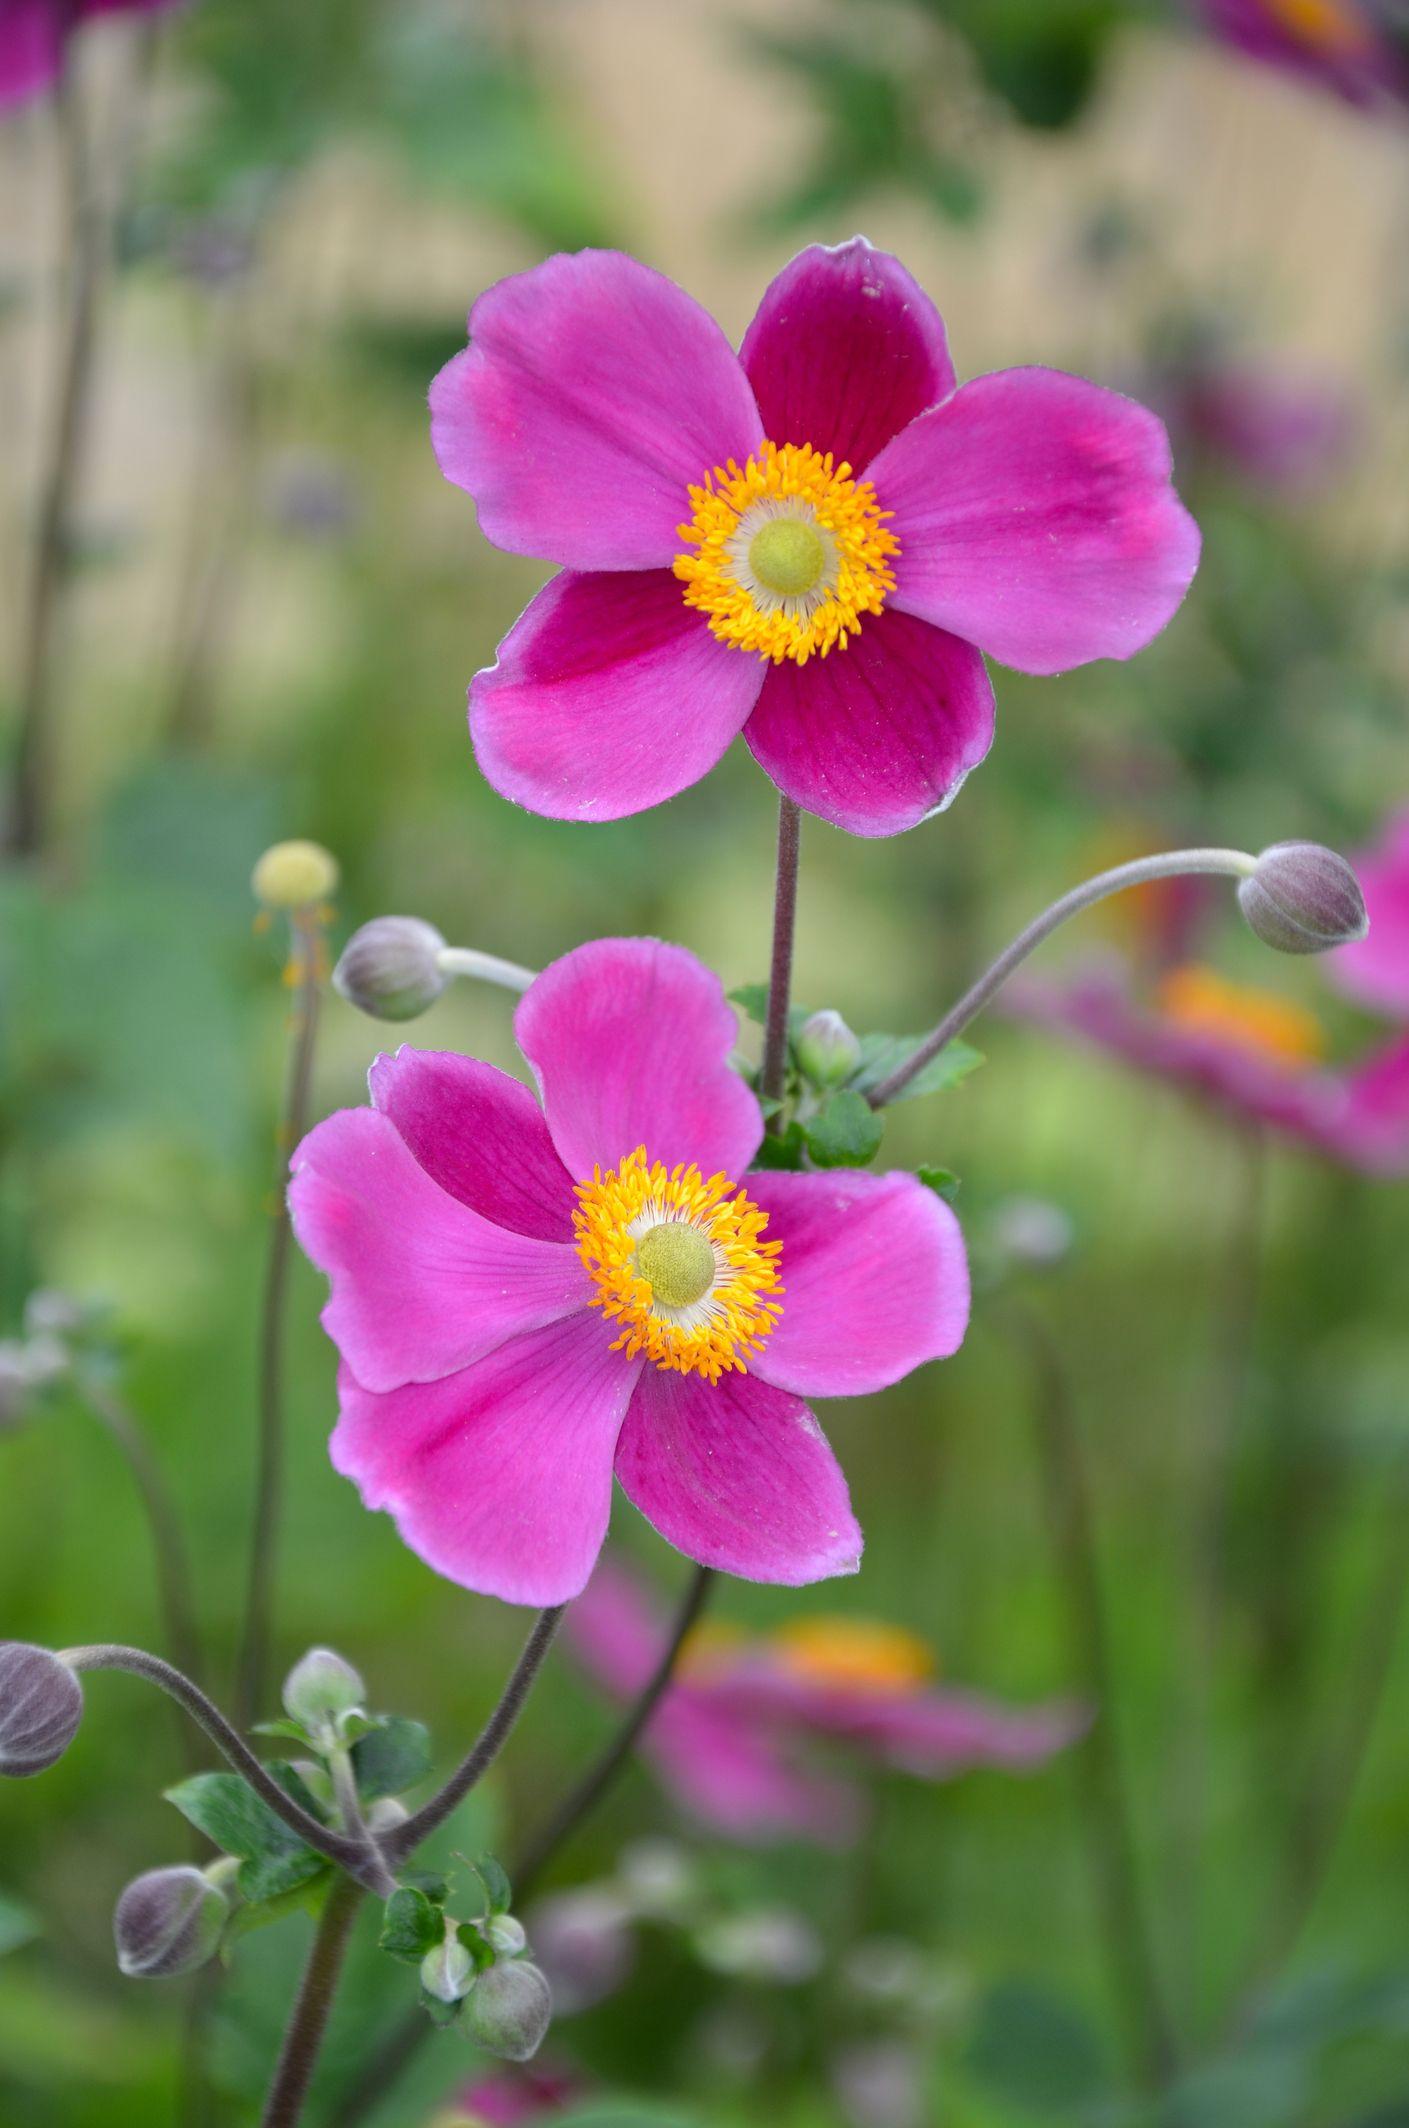 15 Best Fall Flowers For An Autumn Garden Prettiest Flowers To